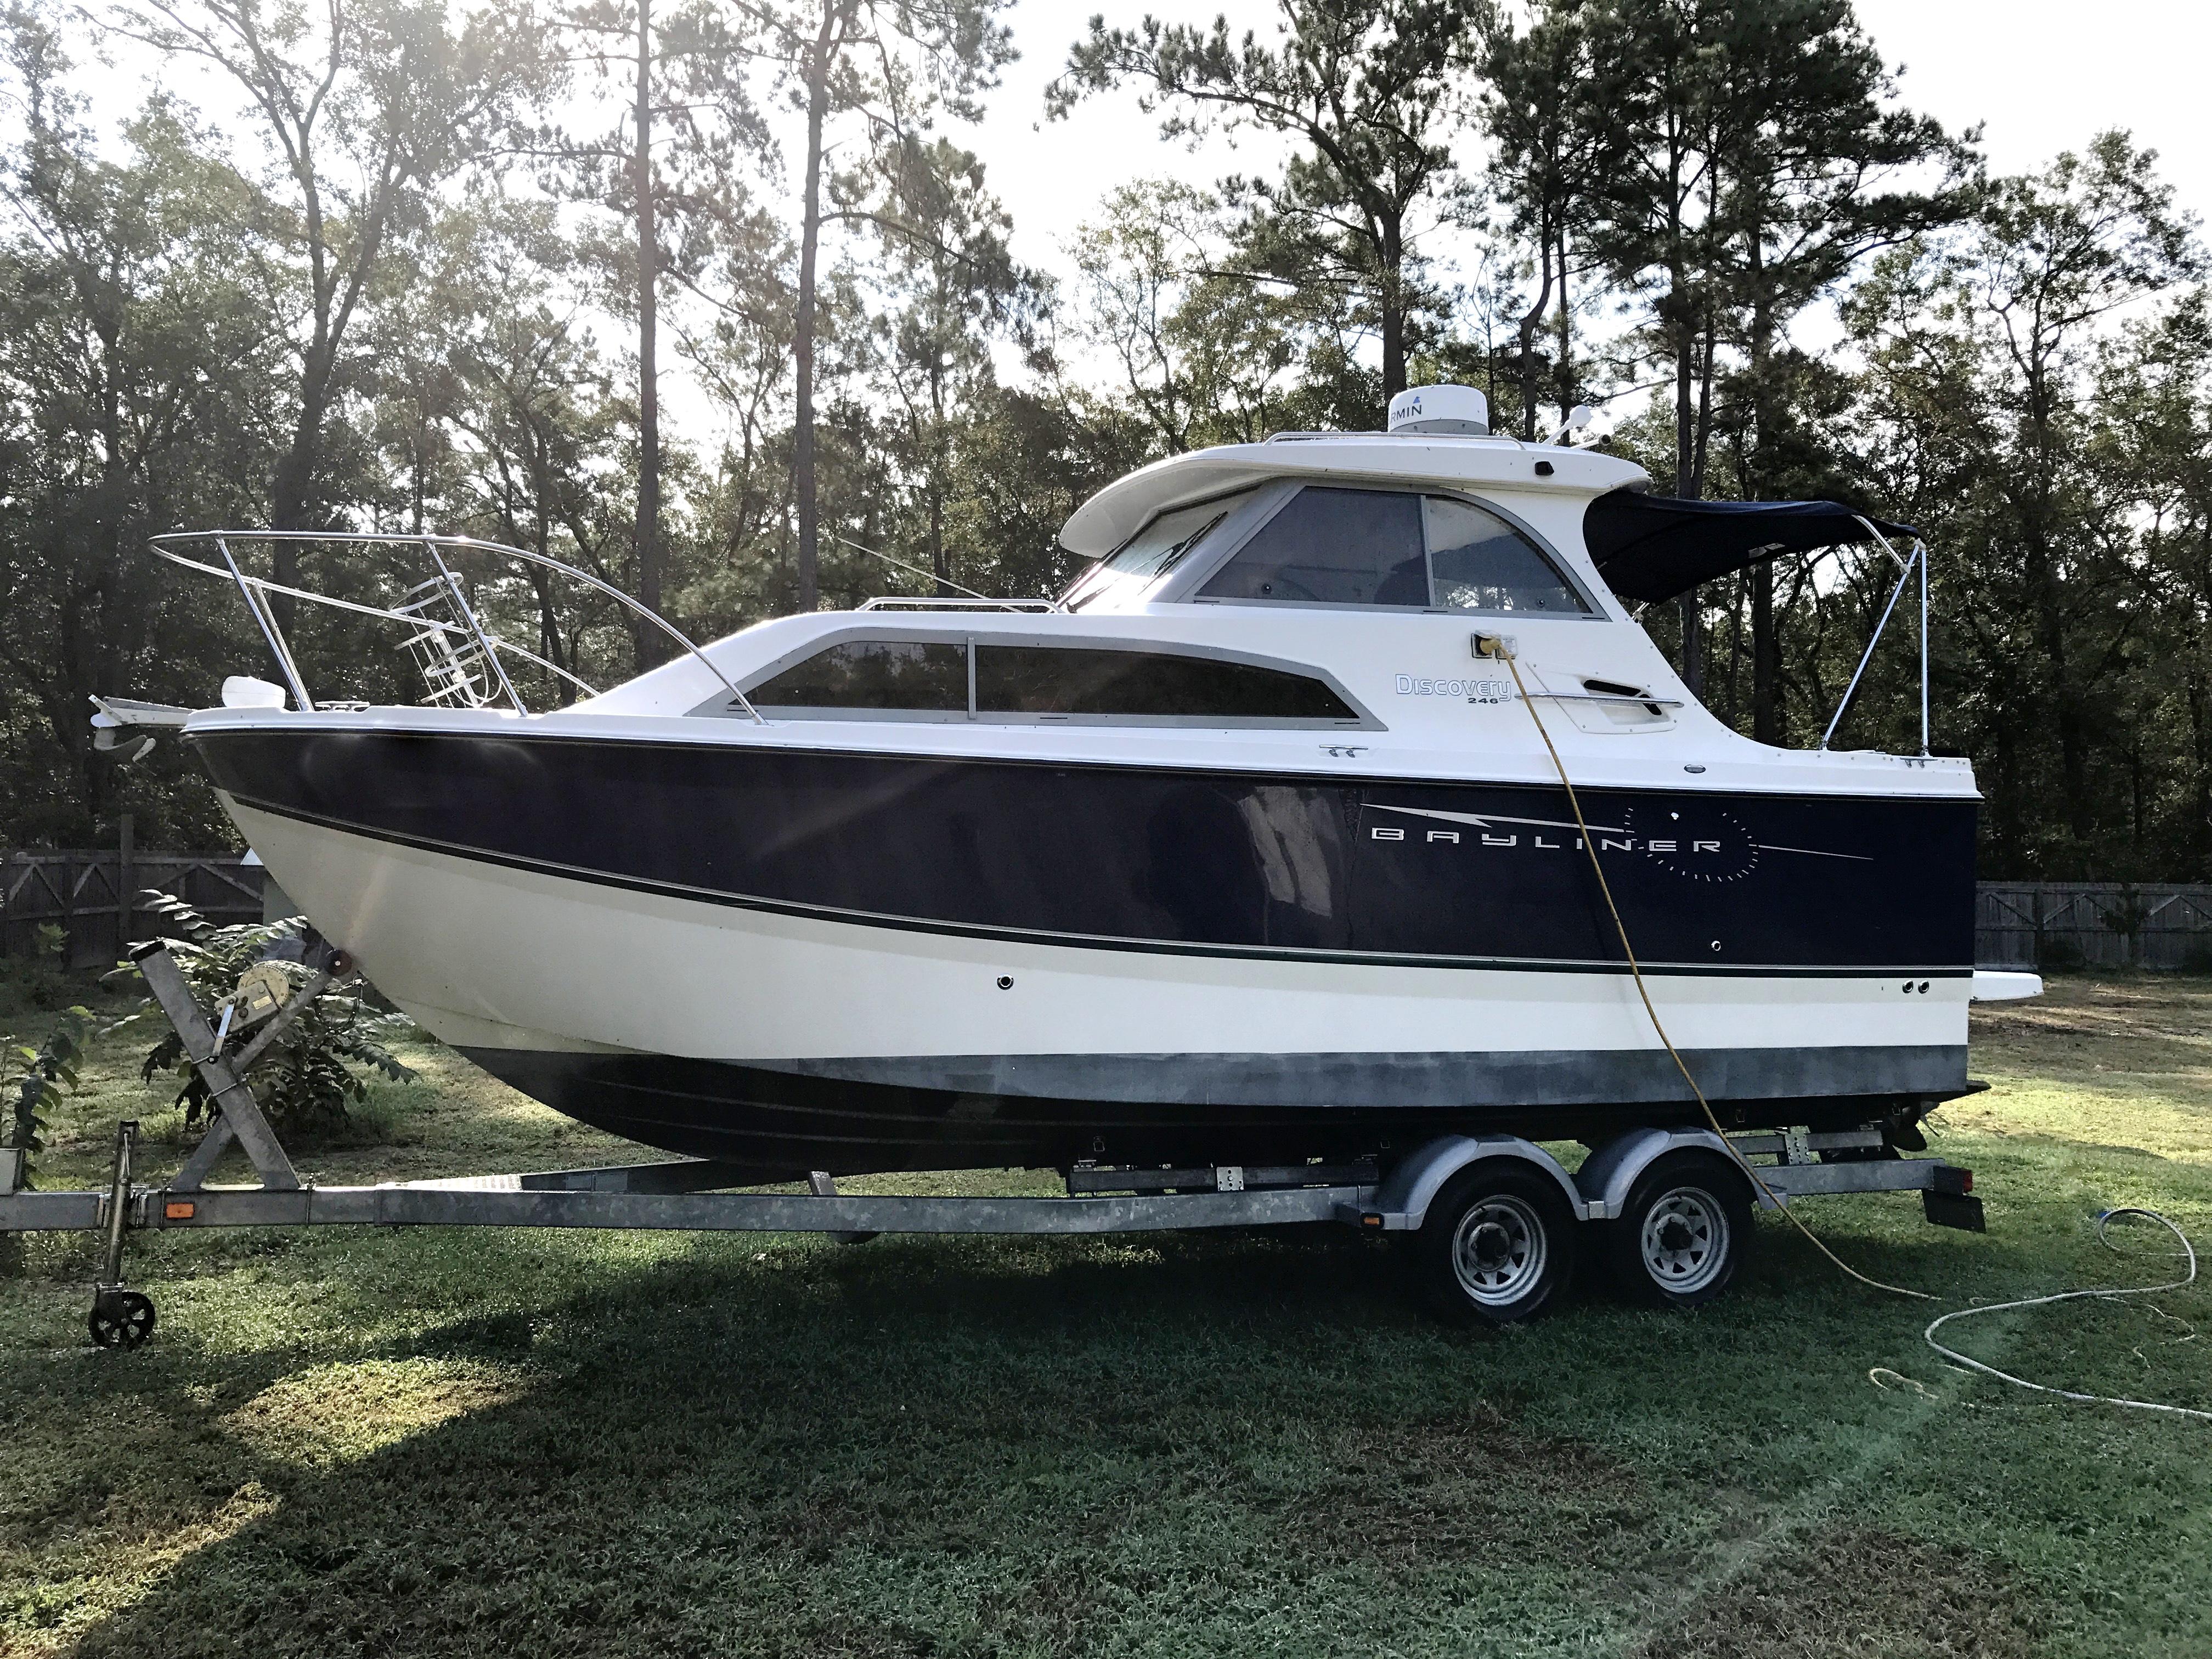 Bayliner Discovery 246 EC - Bayliner 246 Discovery EC and trailer